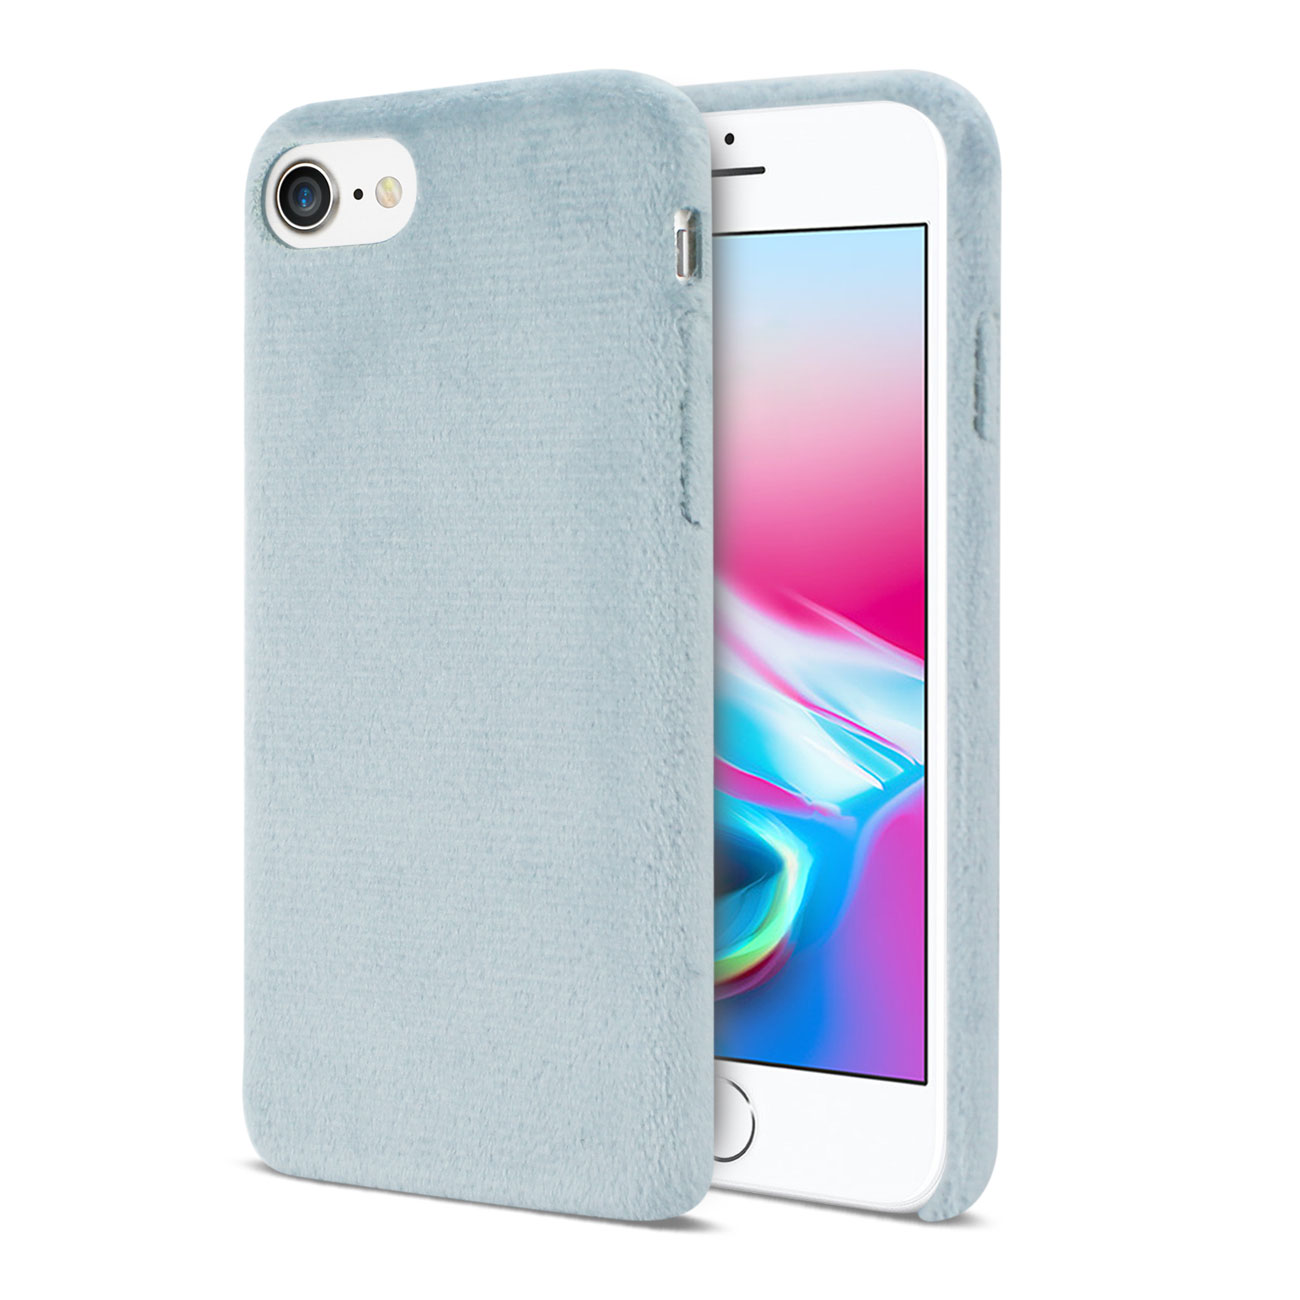 iPhone 8/ 7 Fuzzy Fur Soft TPU Case In Gray